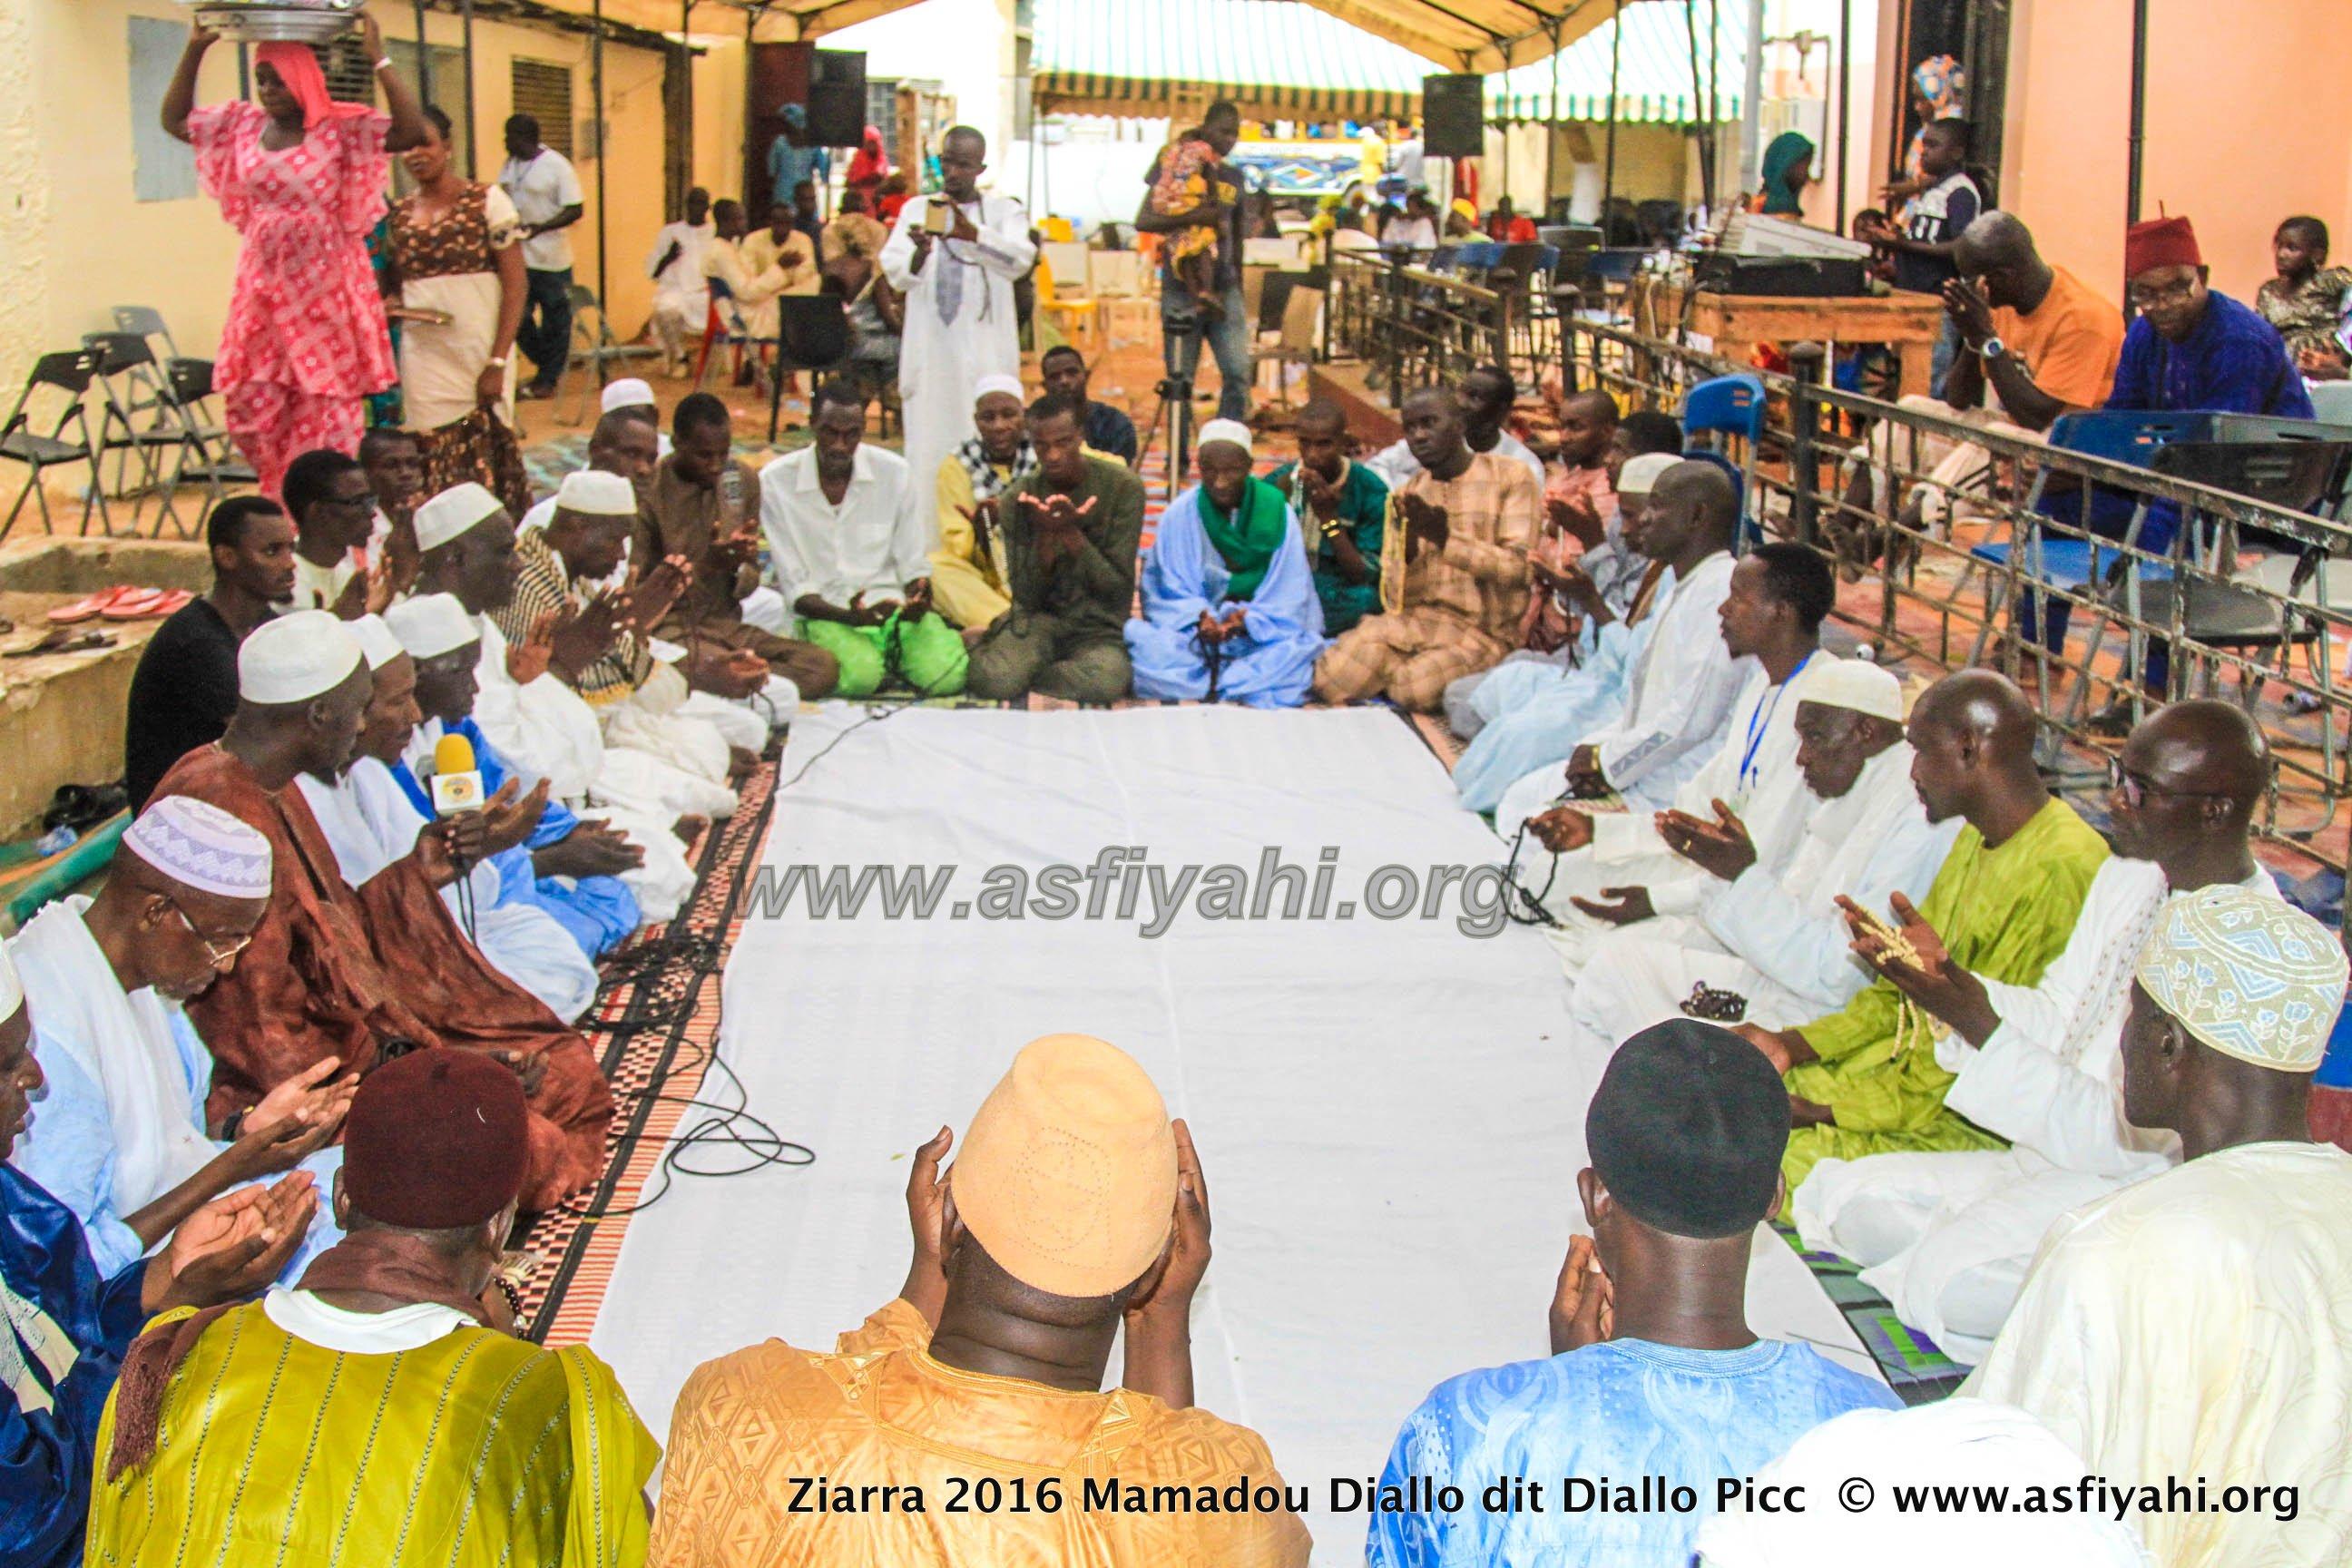 PHOTOS - 30 JUILLET 2016 À THIAROYE - Les Images de la Ziarra El Hadj Amadou Diallo dit Diallo Pithi